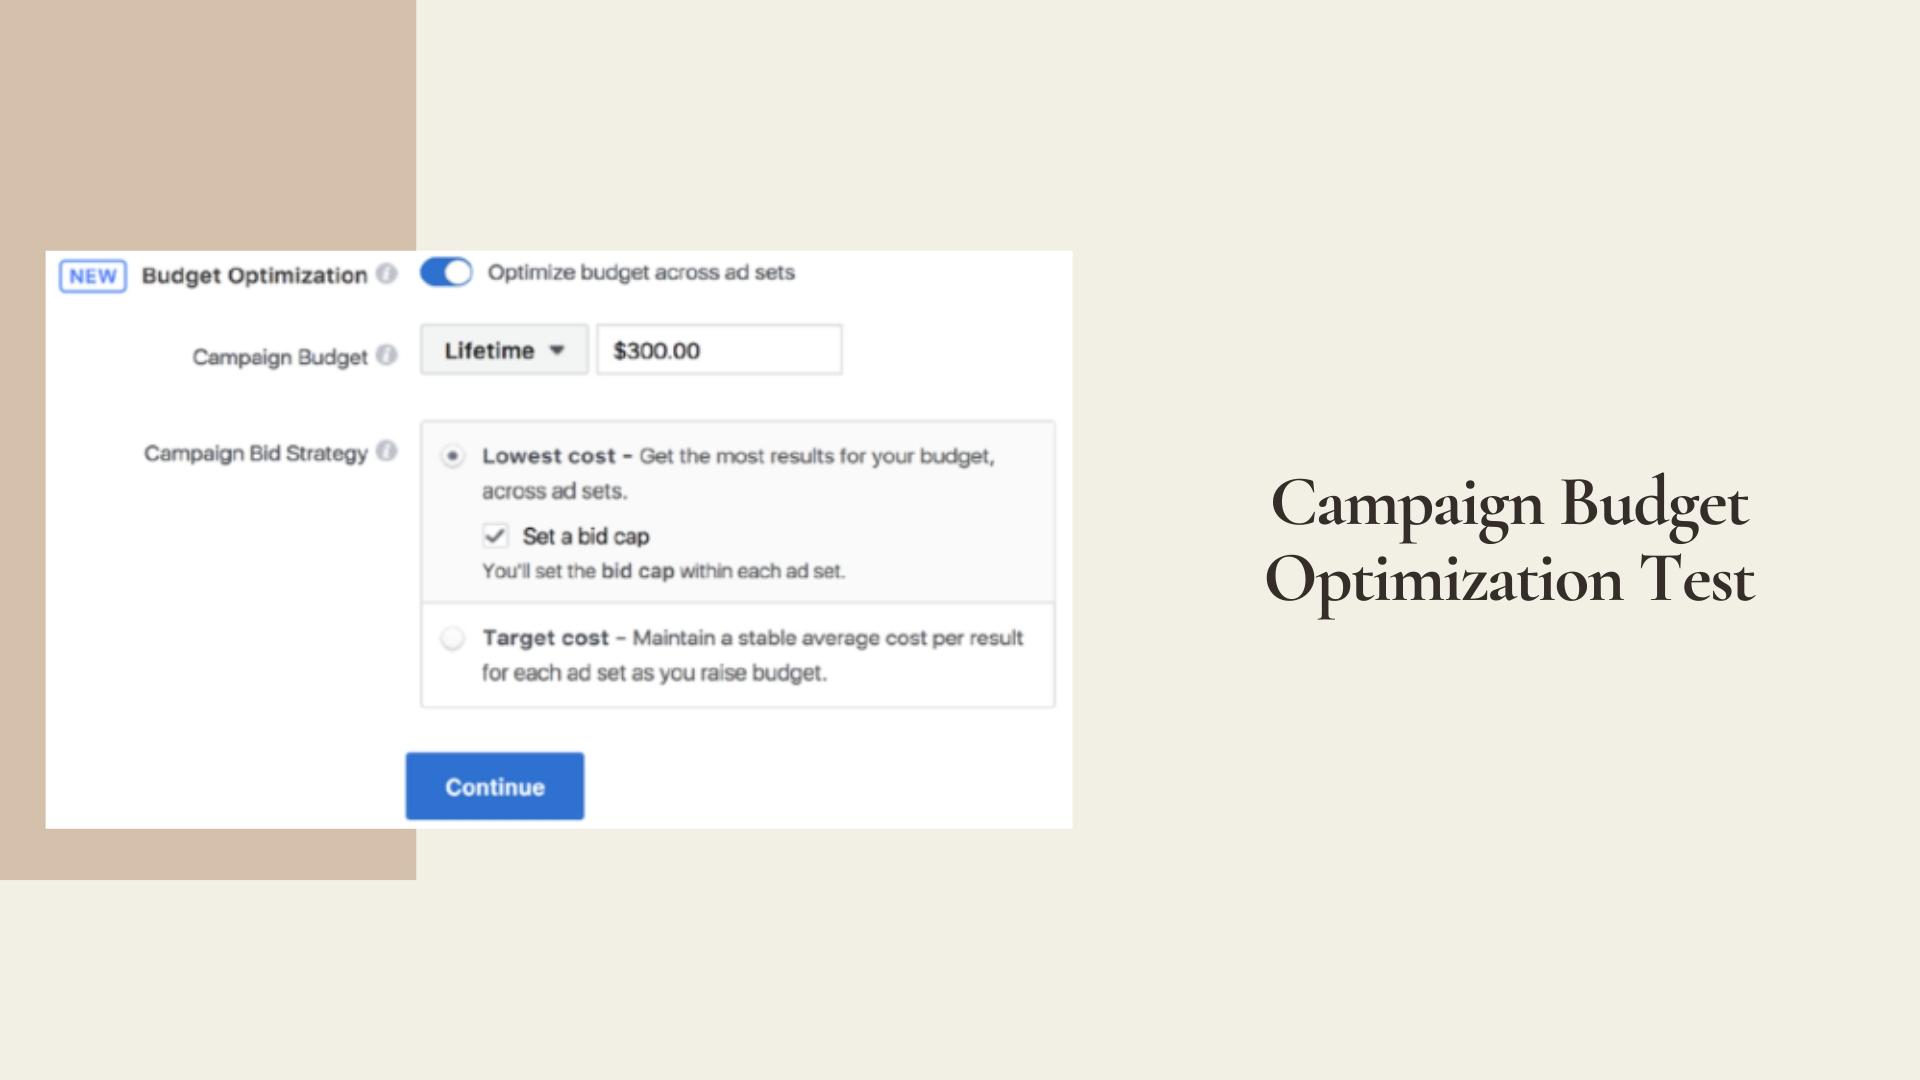 Campaign Budget Optimization Test